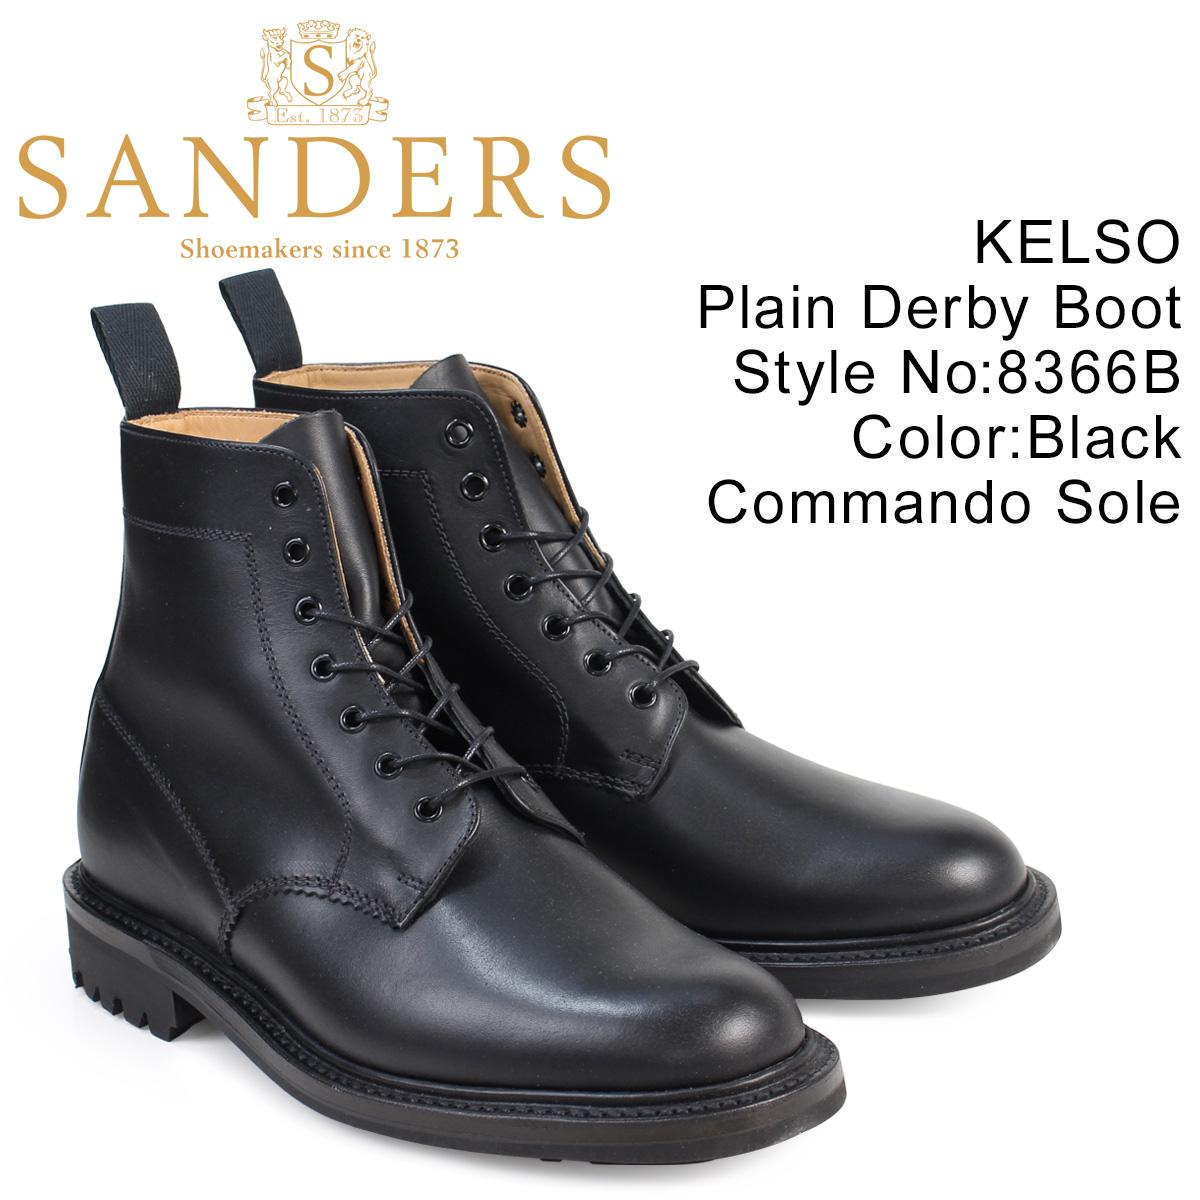 SANDERS KELSO サンダース 靴 ミリタリー ダービー ブーツ プレーントゥ 8366B メンズ ブラック